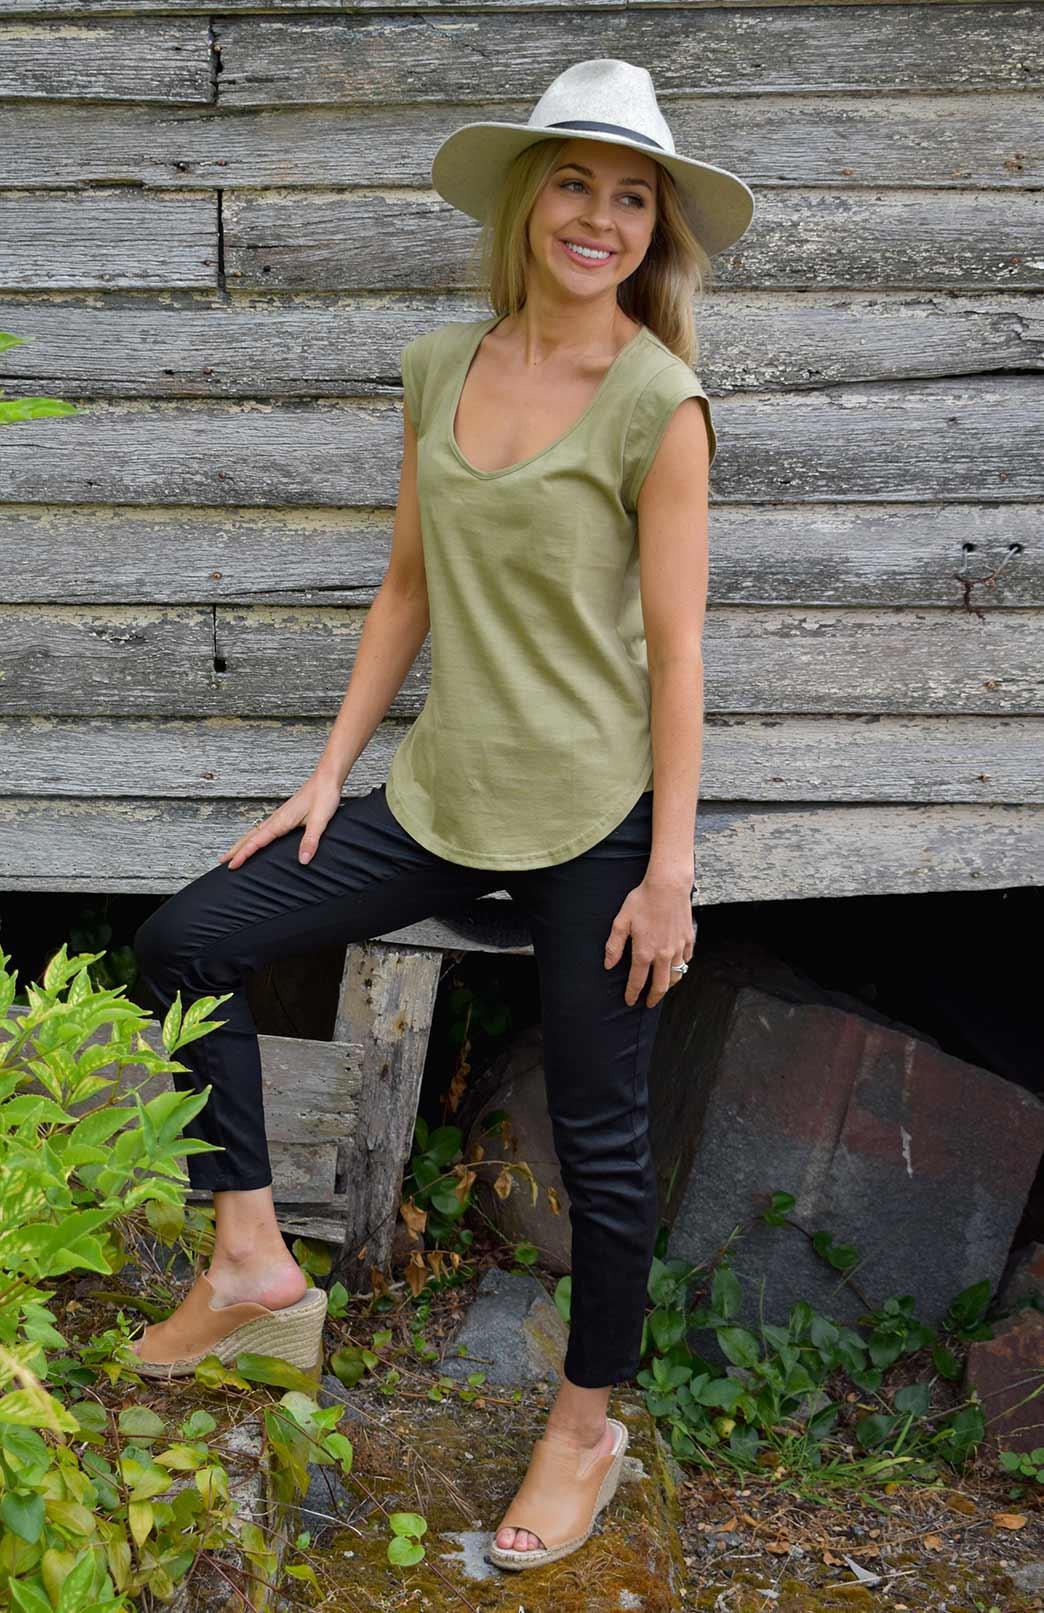 Cap Sleeve T-Shirt (Organic Cotton) - Women's Purple Organic Cotton Cap Sleeve T-Shirt with Sweetheart Neckline and Side Detailing - Smitten Merino Tasmania Australia